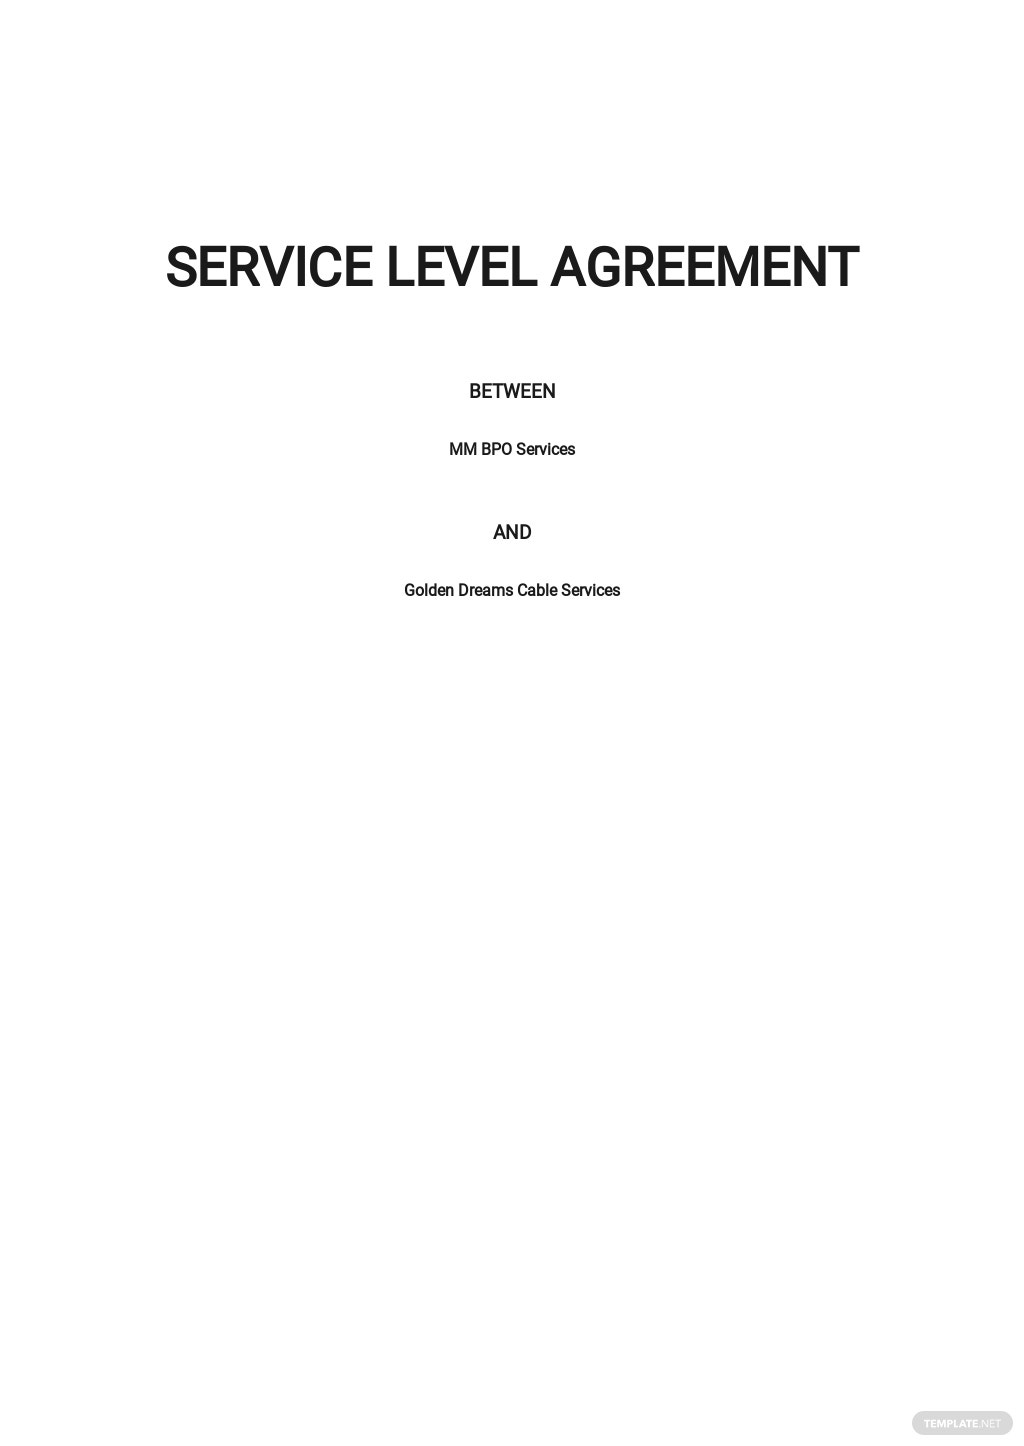 Simple Service Level Agreement Template.jpe